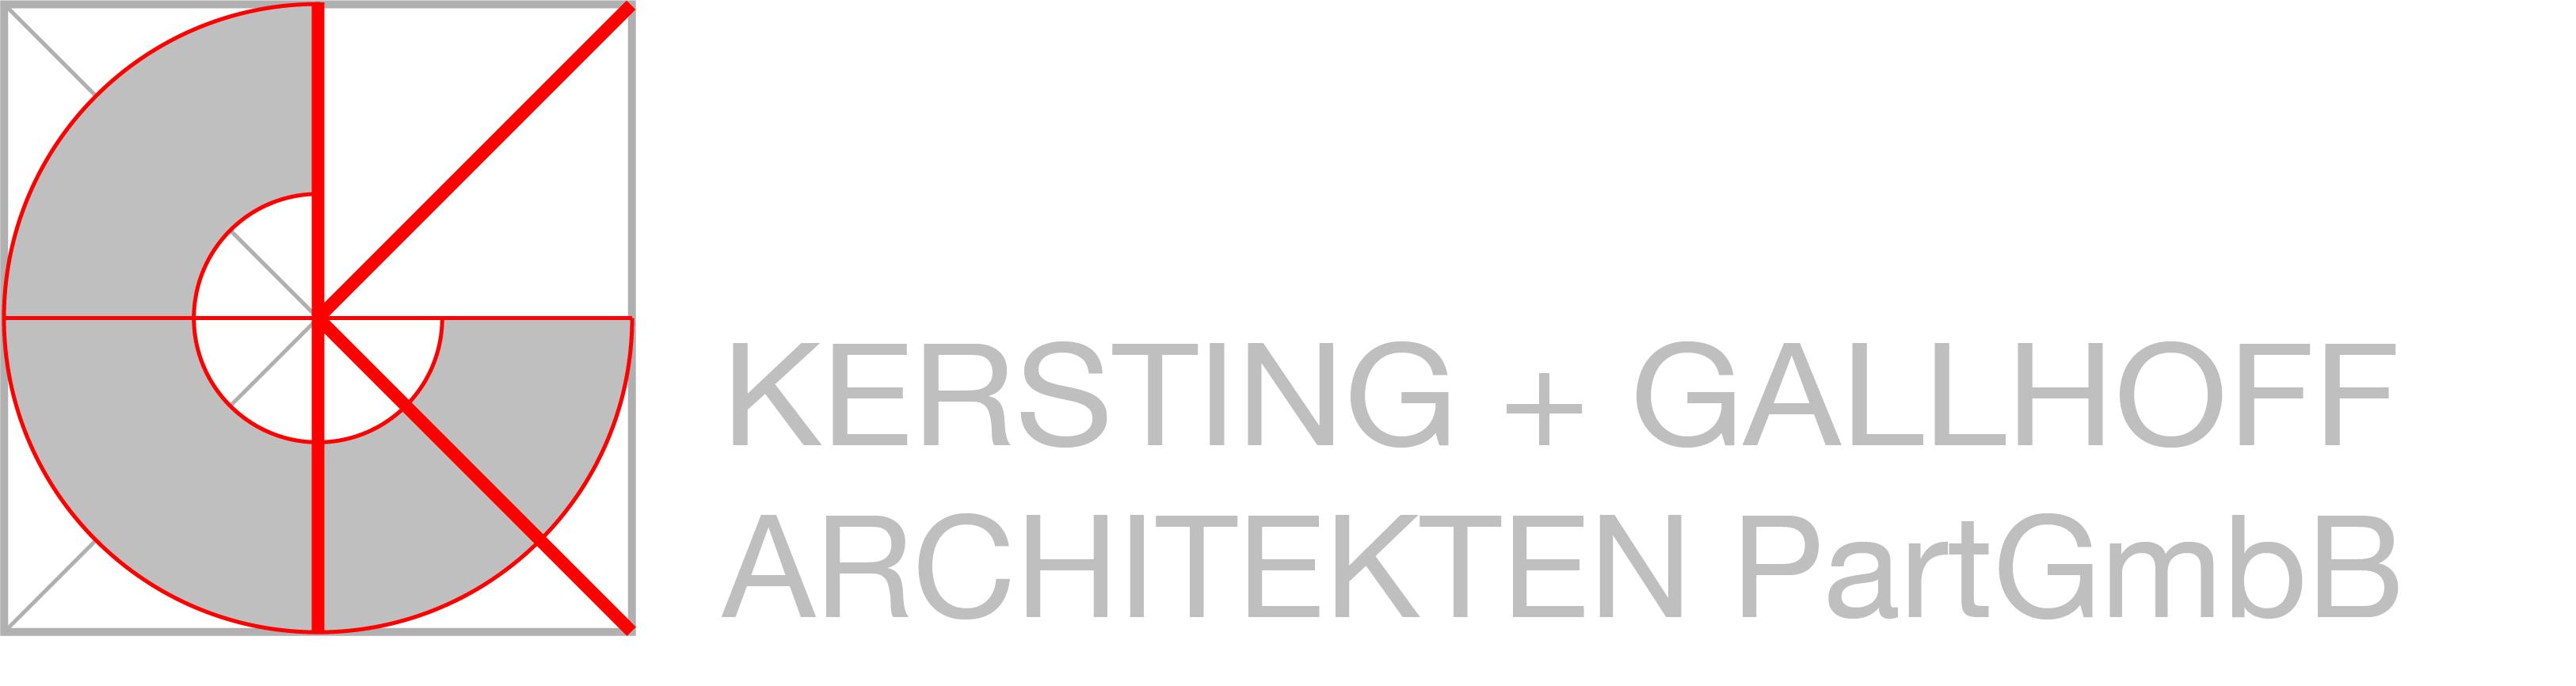 KERSTING + GALLHOFF